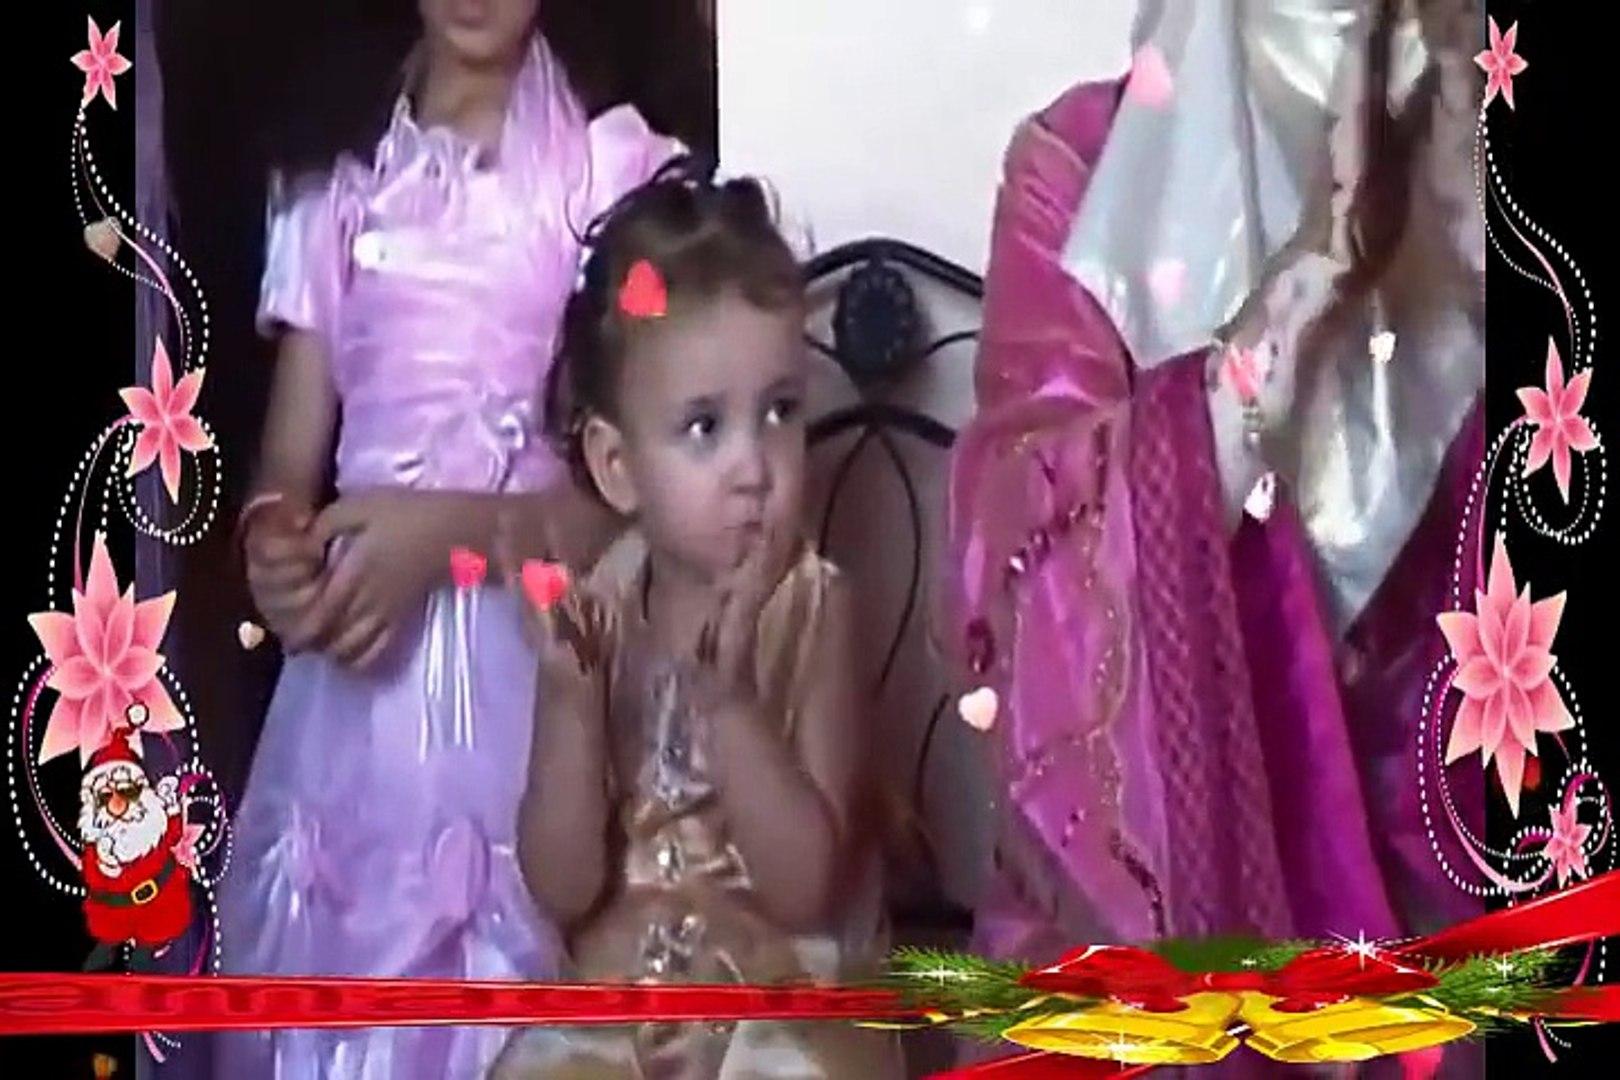 جديد سلوى اجمل رقص عرس مغربي ساخن جدا لشطيح والرديح jadid ch3bi salwa top♫ ♥2015